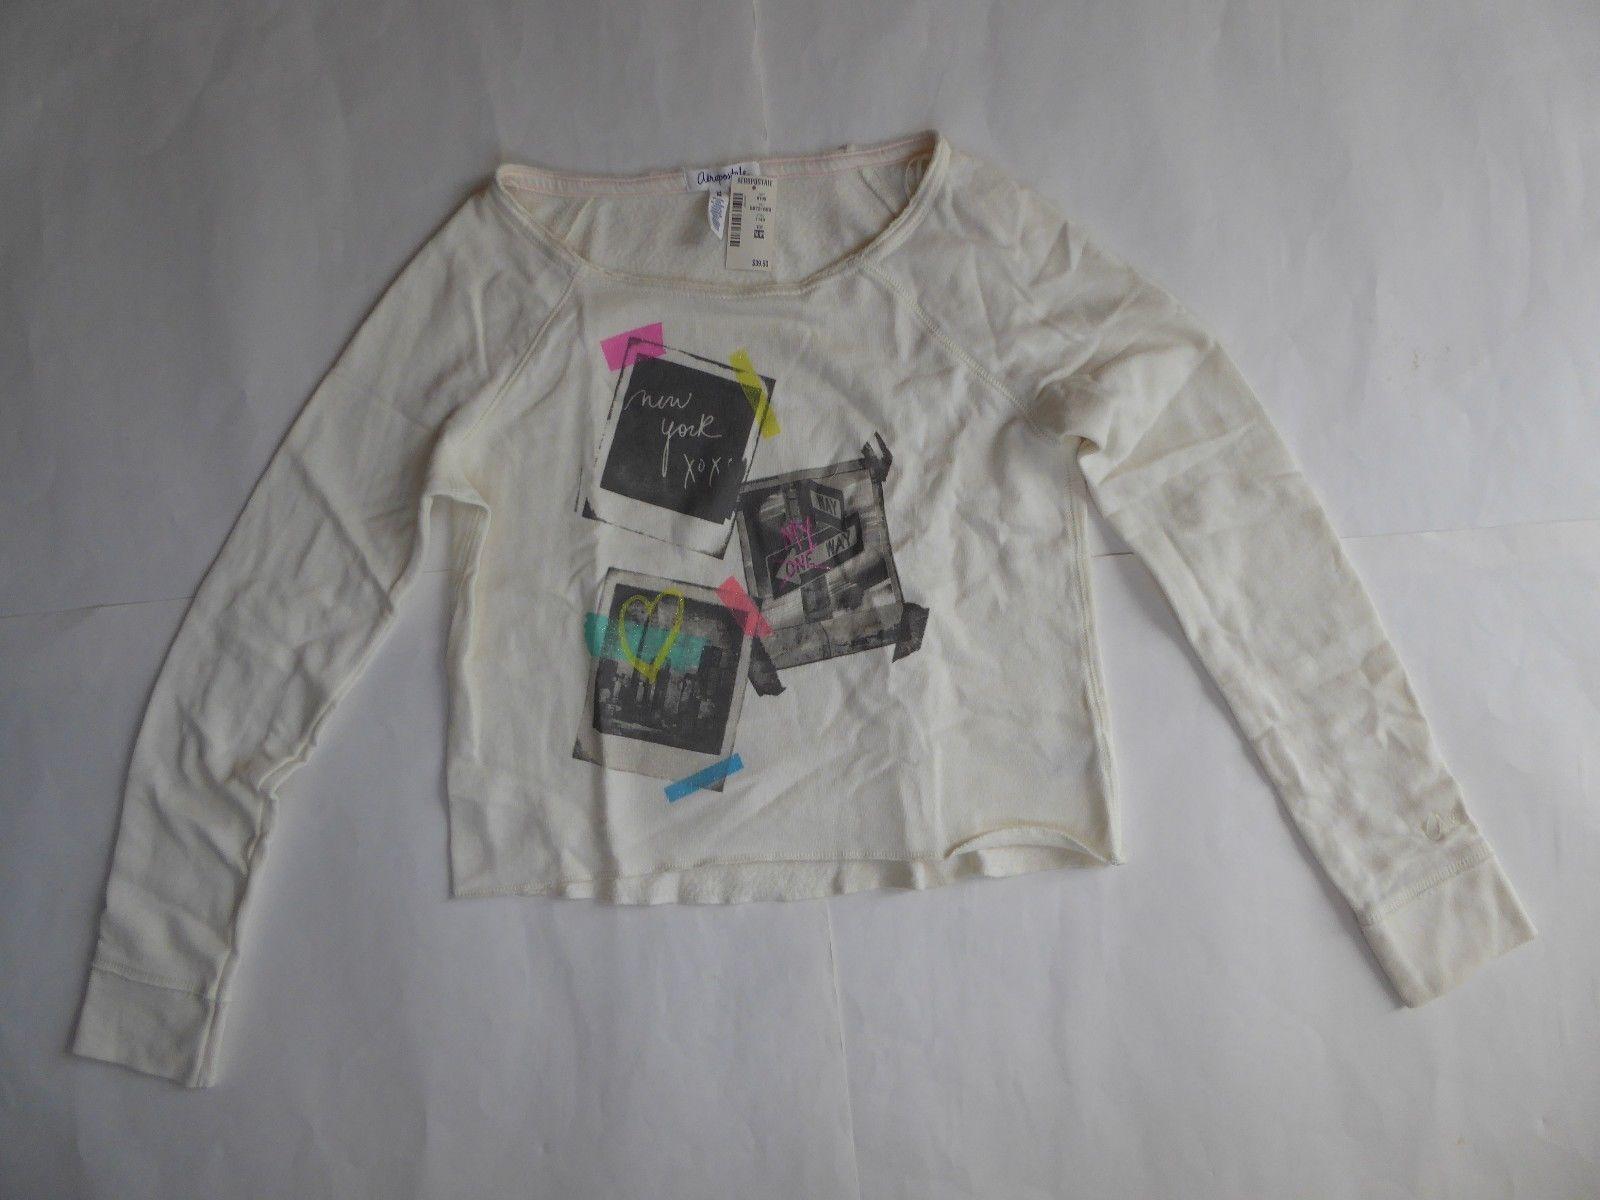 Aeropostale New York Crop Sweatshirt Size Medium Beige Graphic RP$39.50 Scoop